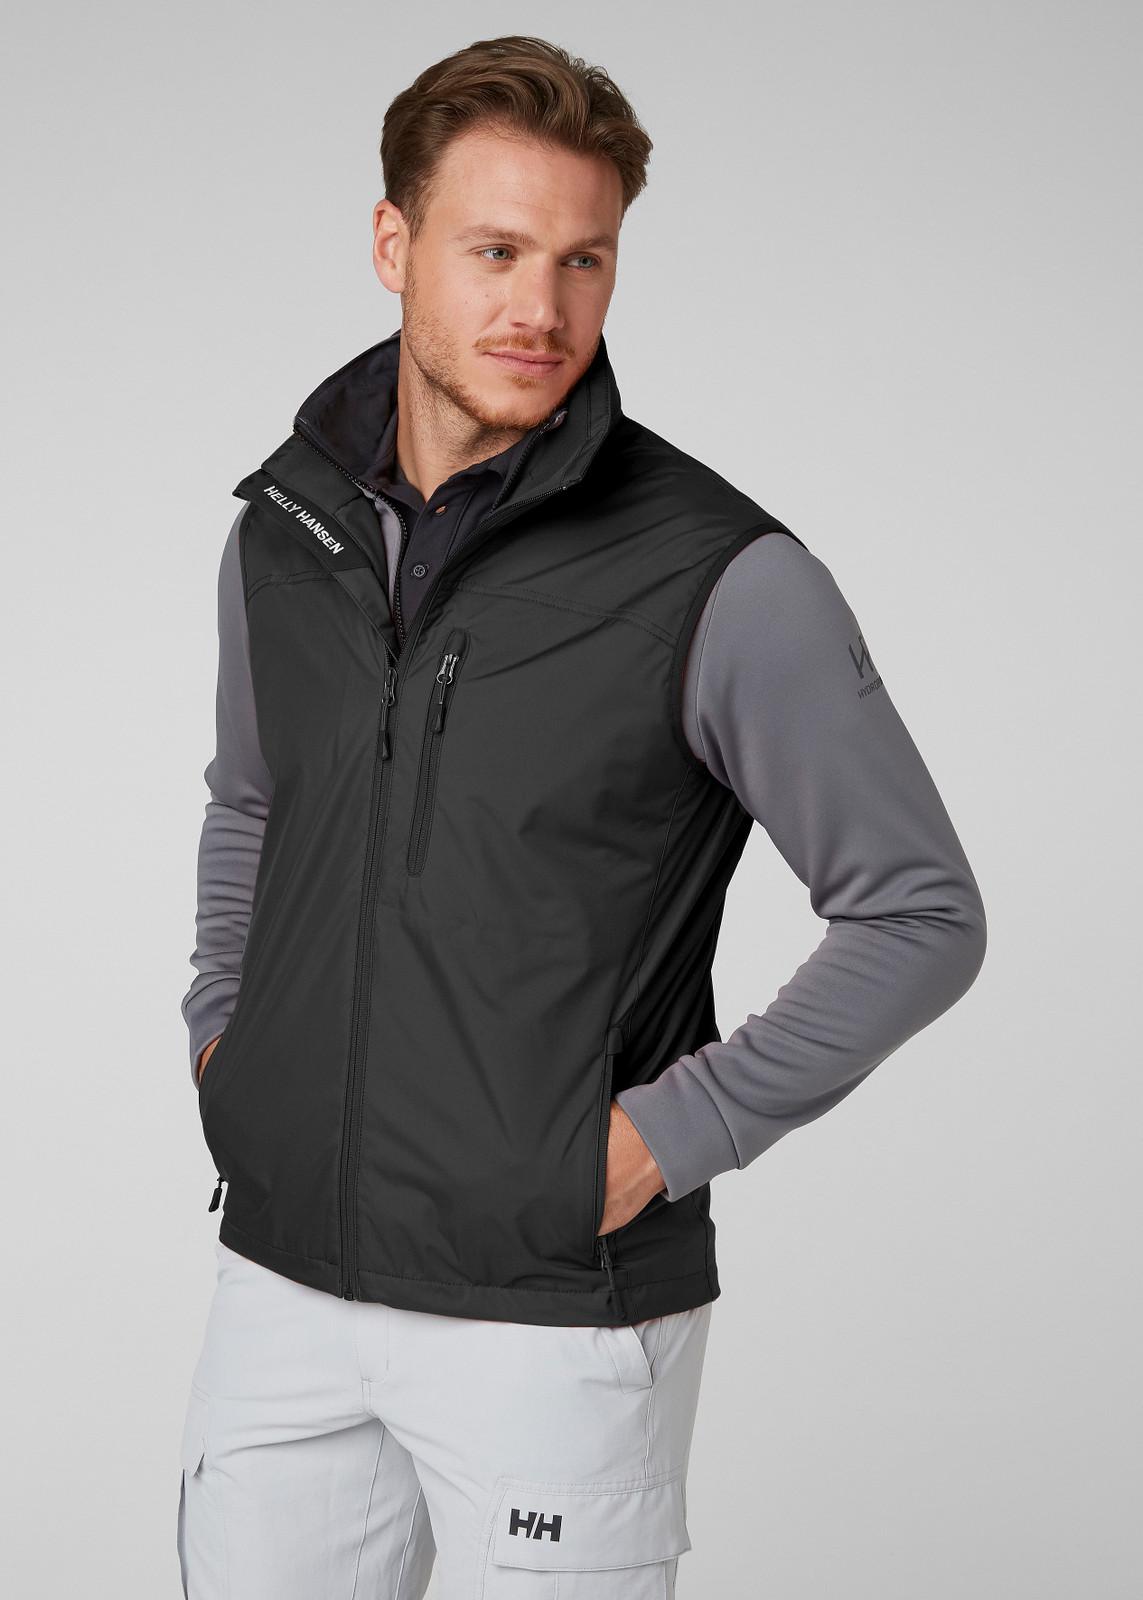 Helly Hansen Crew Vest, Men's - Black, 30270-990 (30270-990) on model